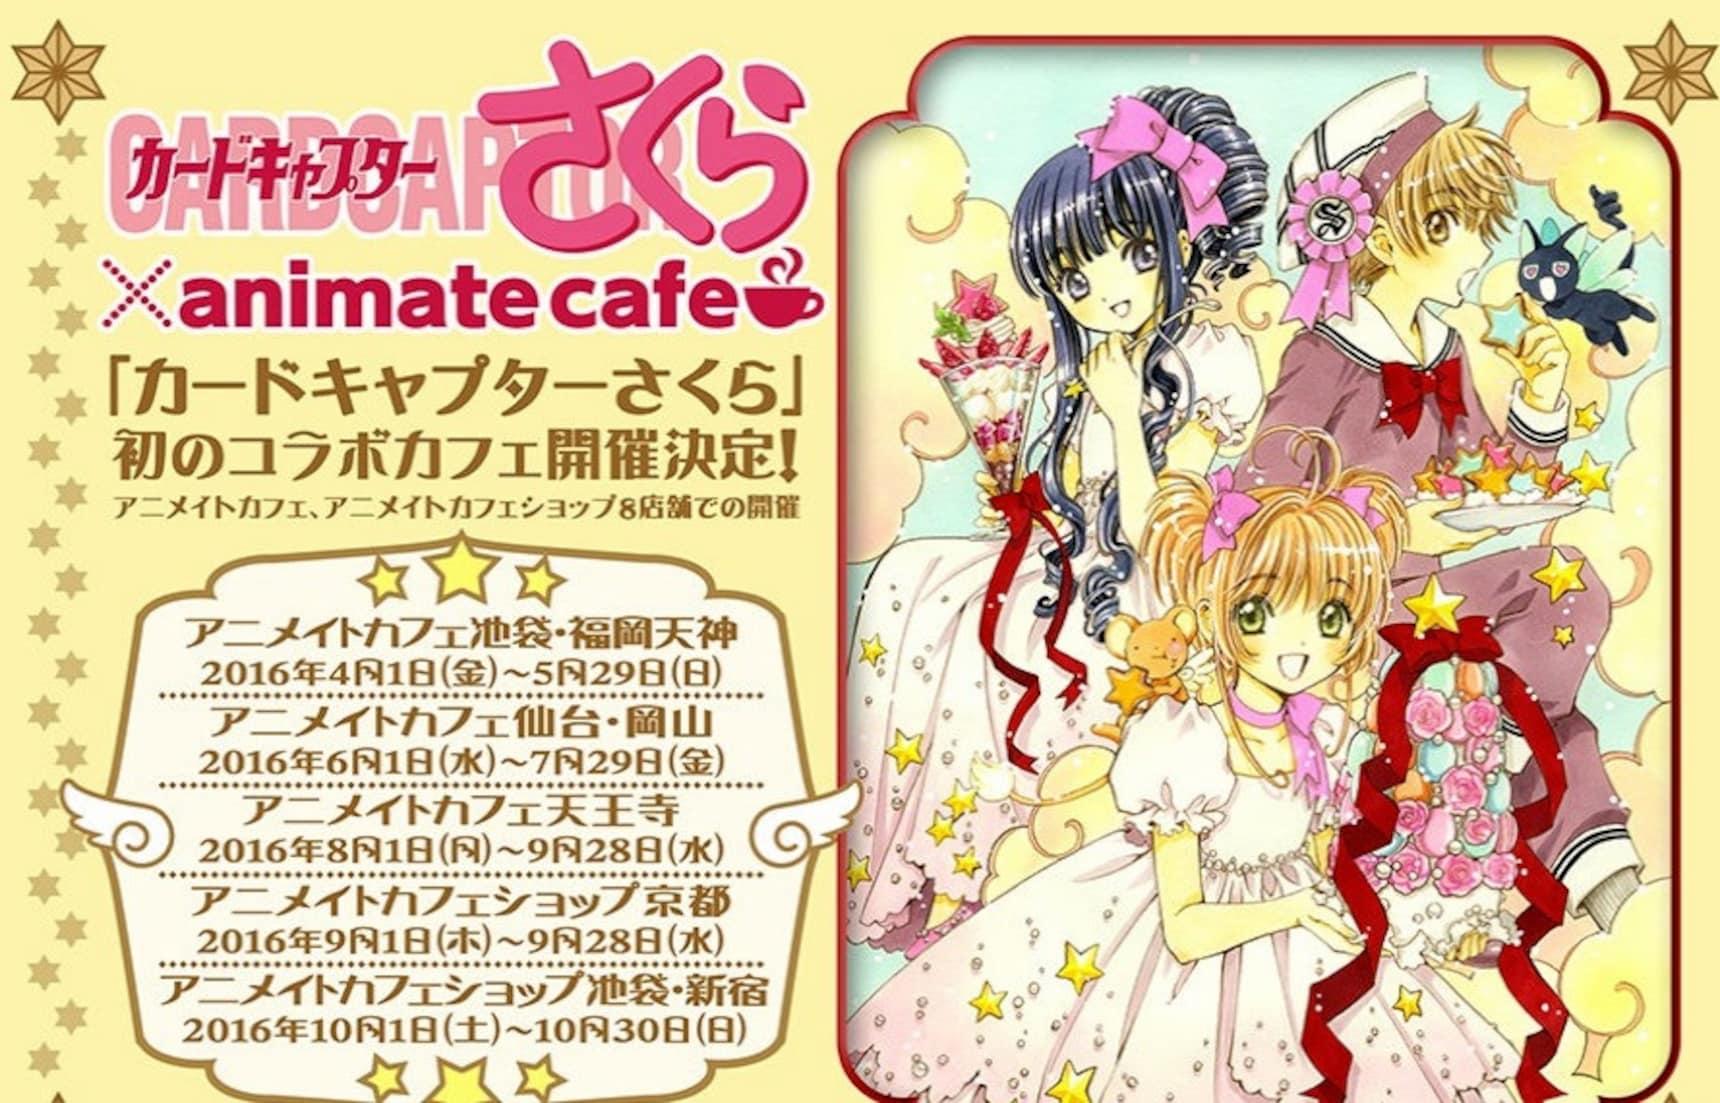 Cardcaptor Sakura Café Coming to Animate